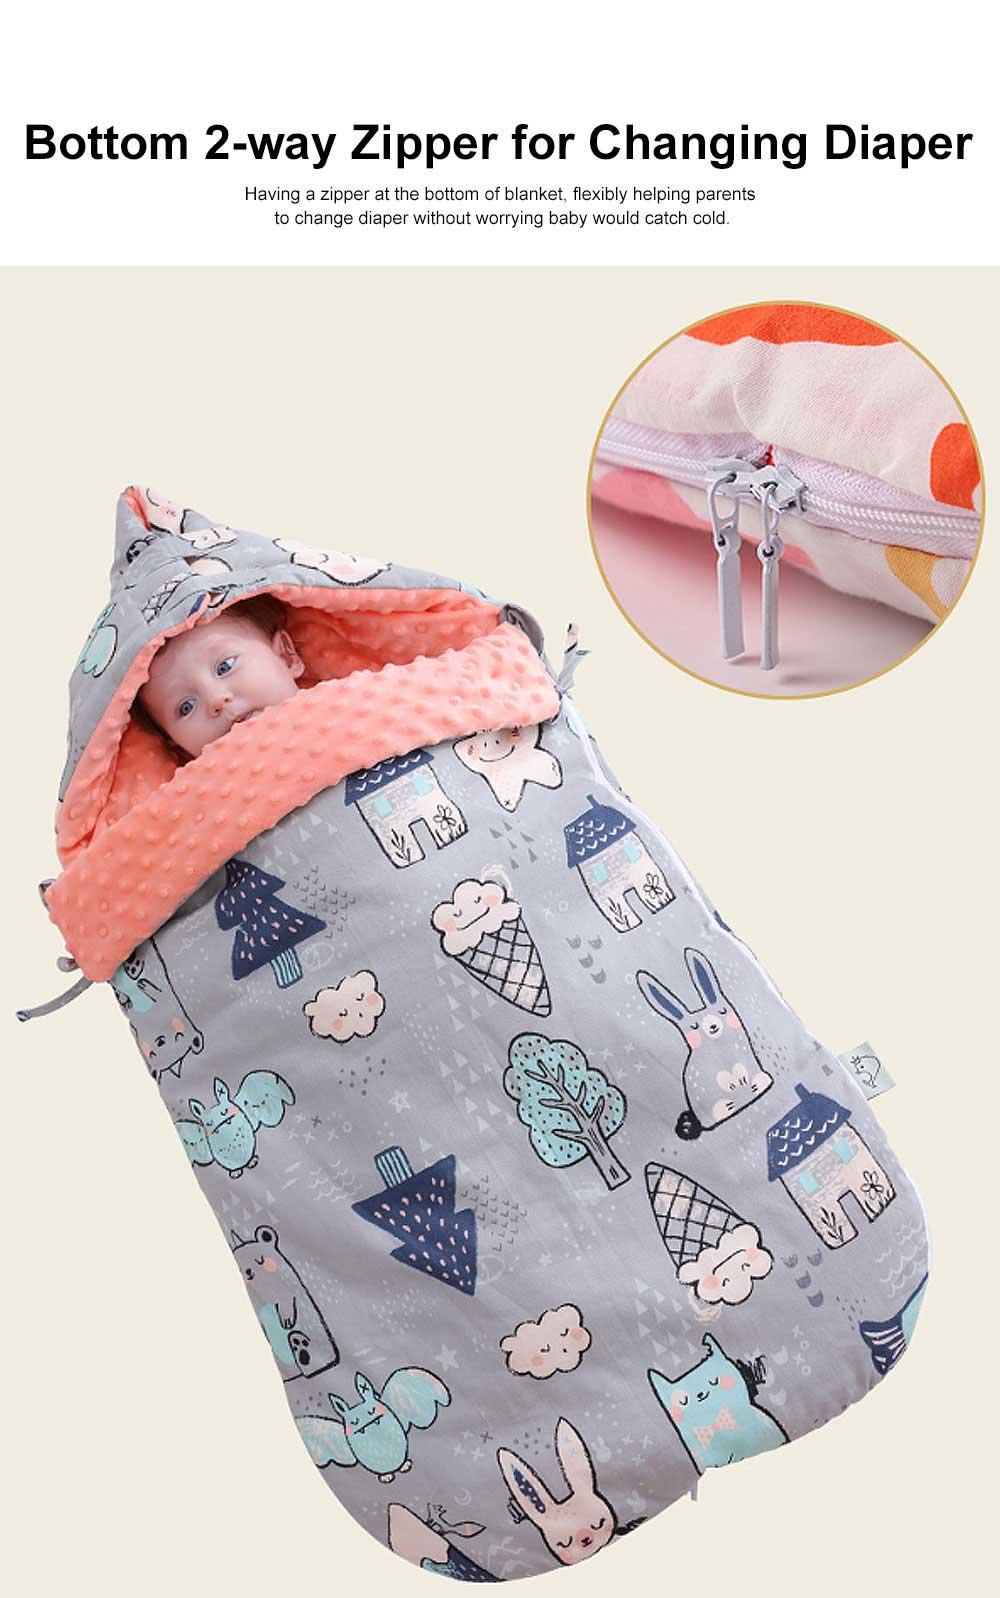 Baby Sleeping Bag Spring Autumn Extra Thick Baby Sleeping Sack, Twitching-safe 100% Cotton Newborn Baby Sleeping Fleabag 1